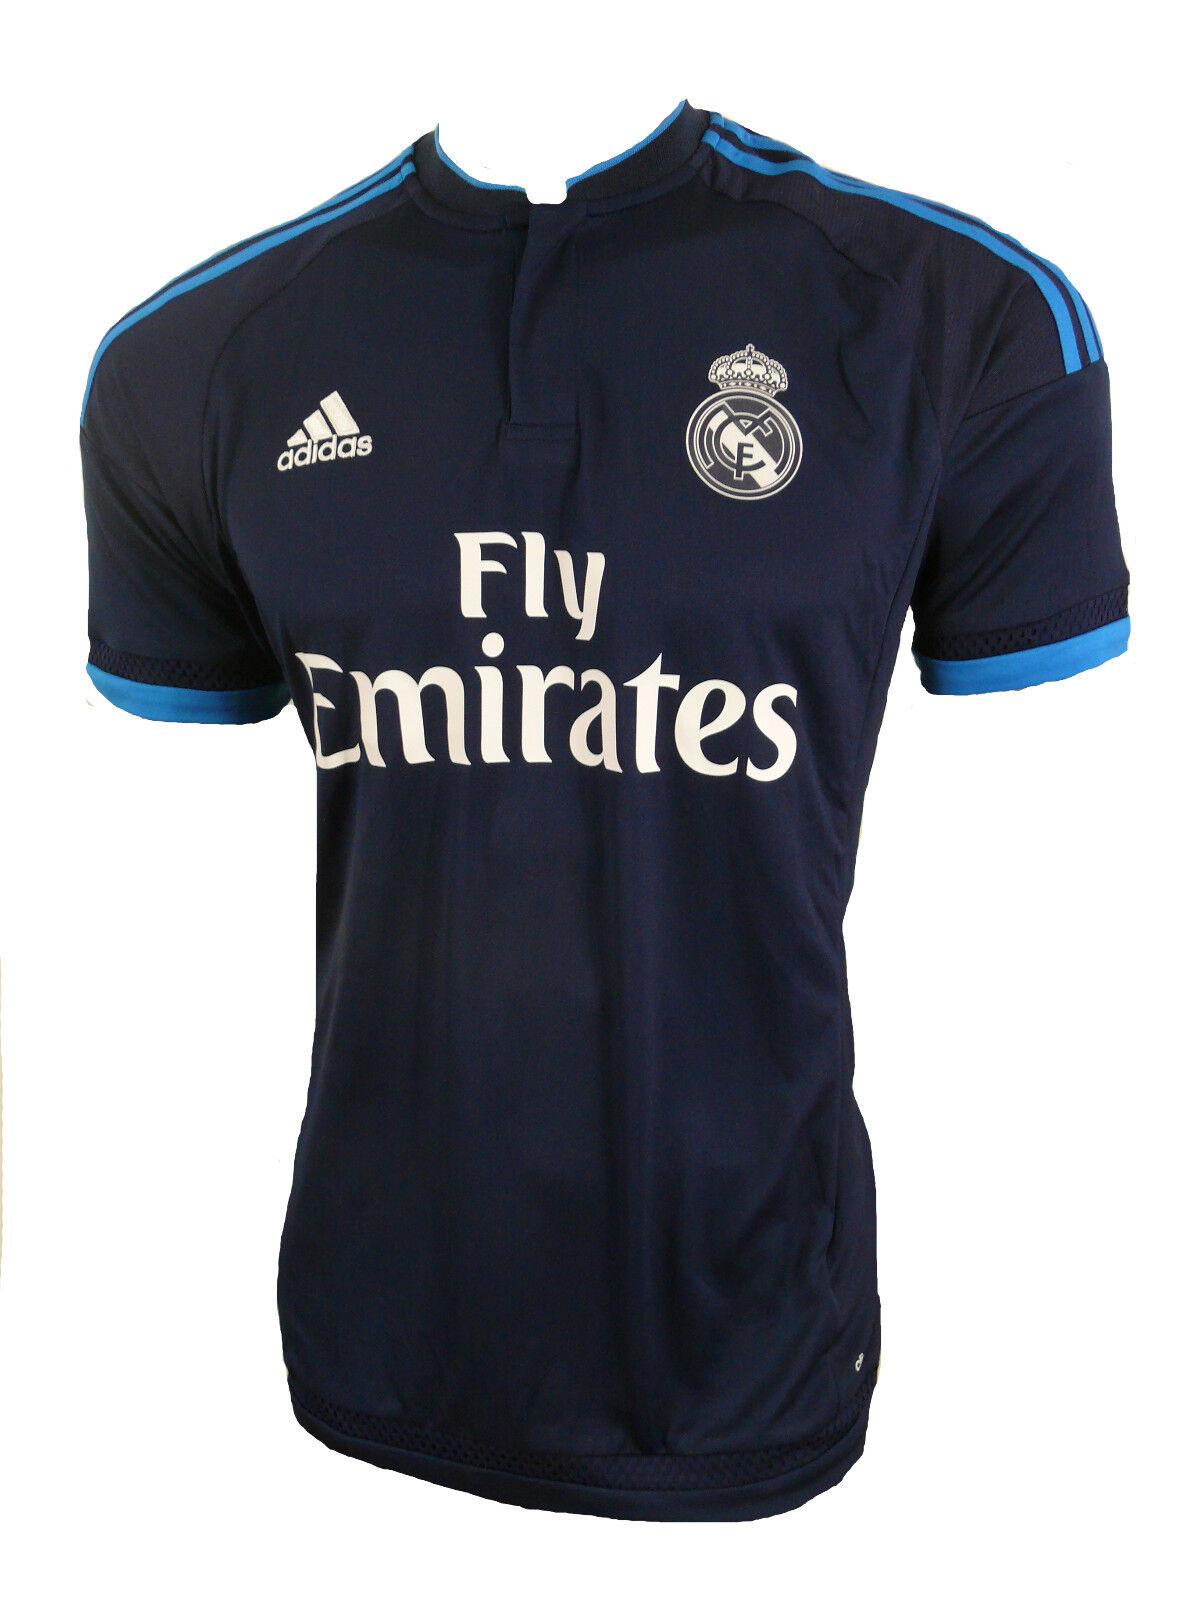 4f912d29d2c Adidas Real Madrid GR.XL Maglia bluee npfxre4248-Squadre spagnole ...